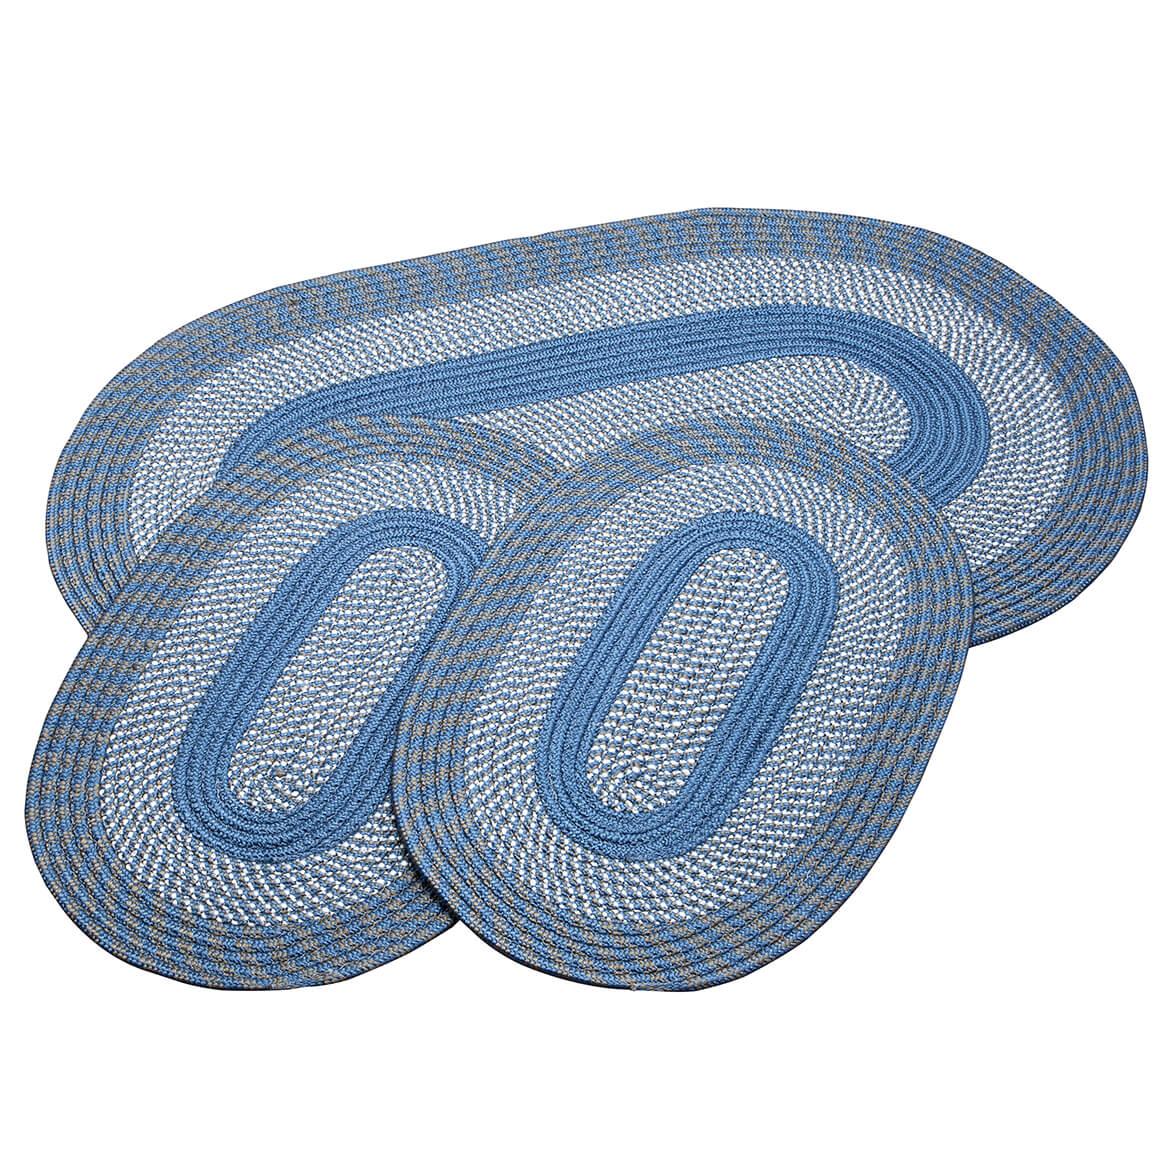 Slate Blue 3-Piece Two-Tone Braided Rug Set by OakRidge™-367535